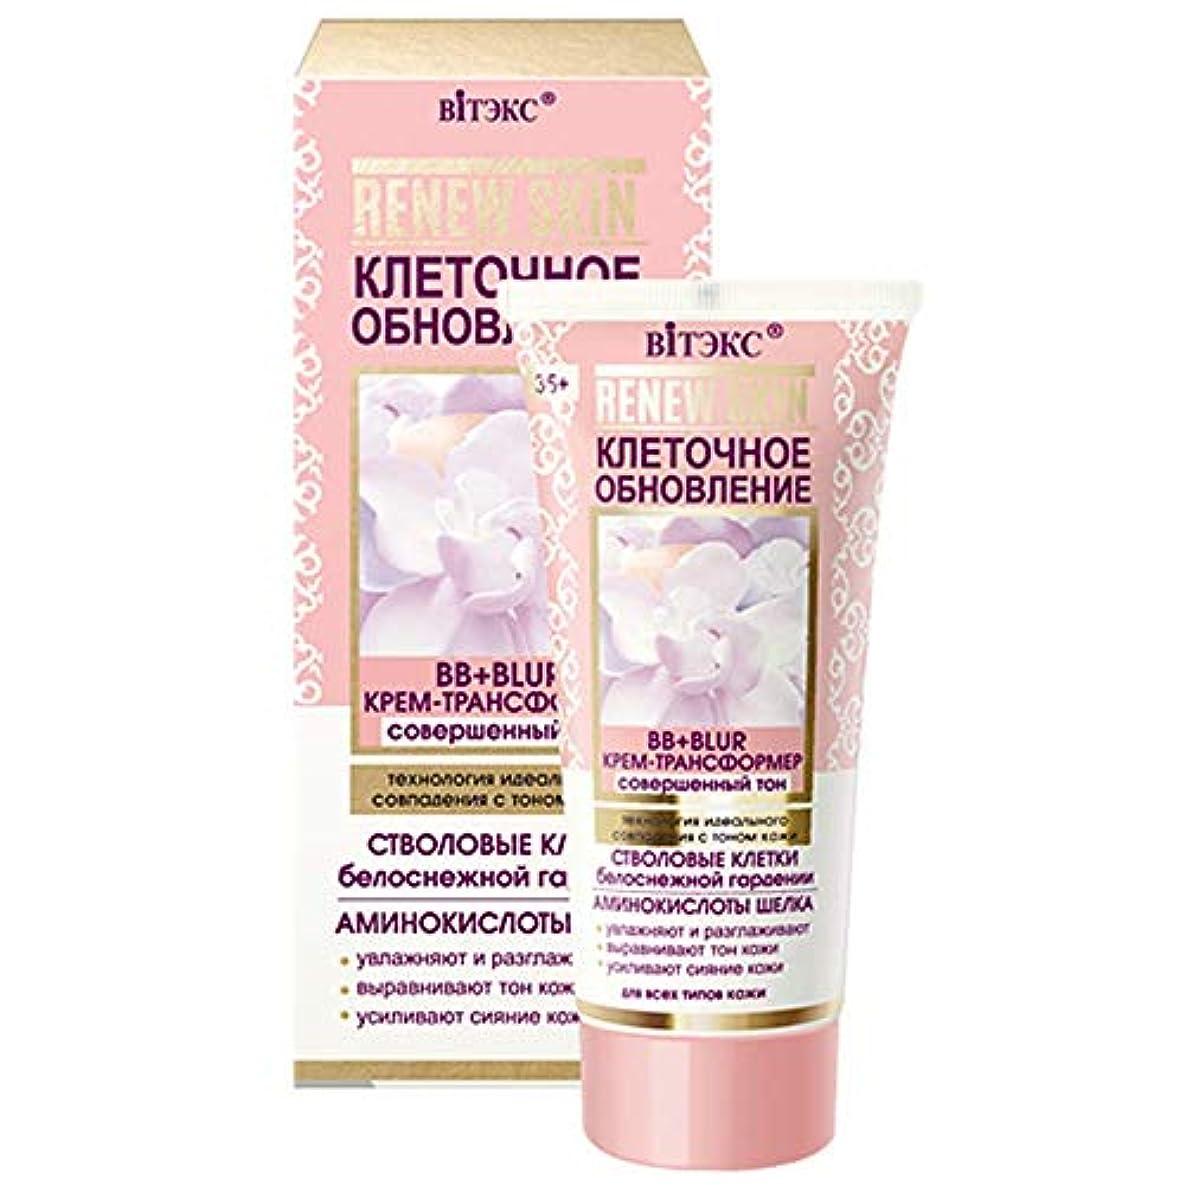 Bielita & Vitex | RENEW SKIN | BB + BLUR CREAM-TRANSFORMER | Perfect tone technology of perfect match with skin...